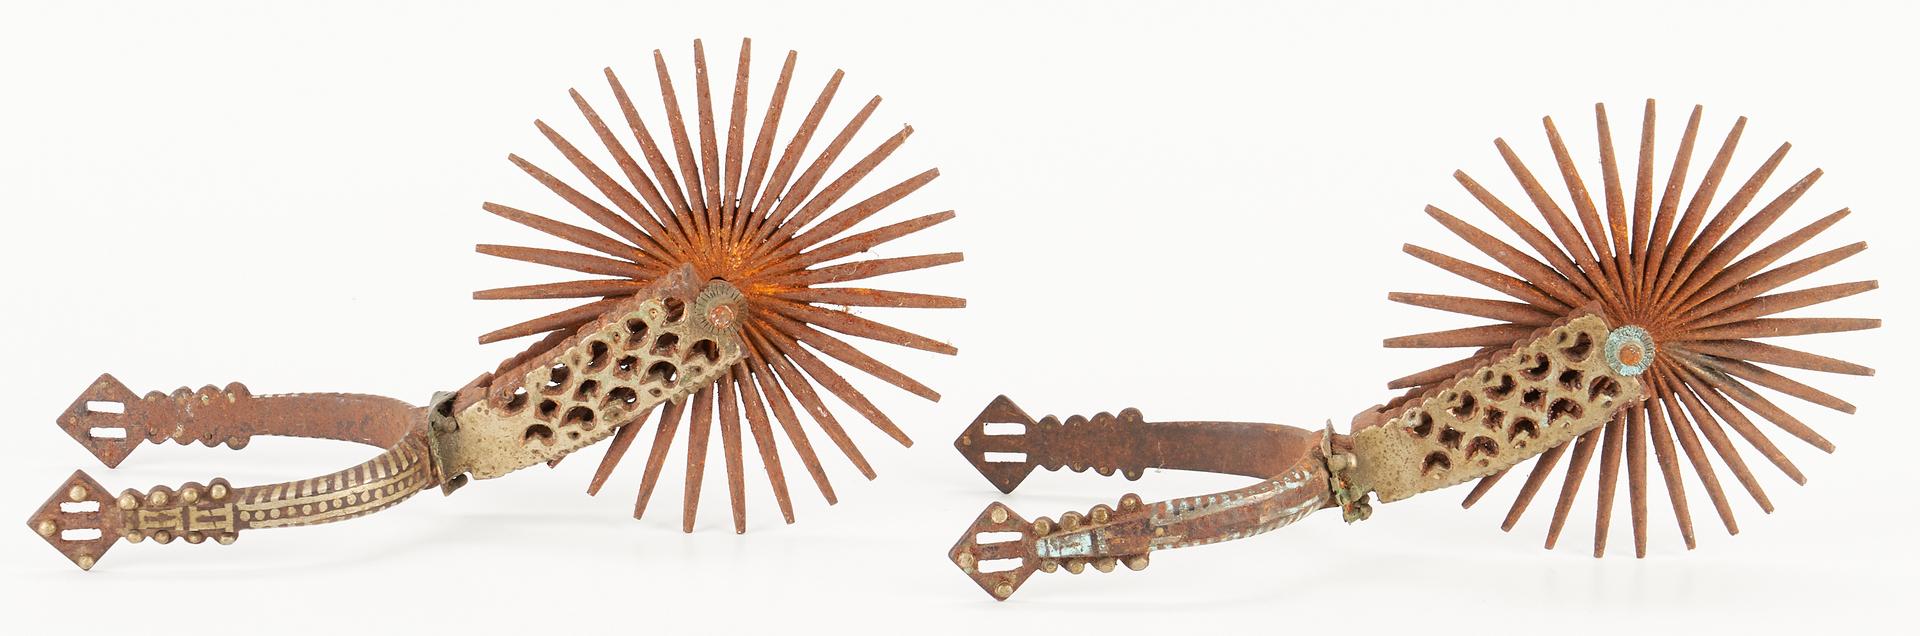 Lot 218: Brass Pistol Door Knocker & Espuela Grande Style Spurs, 6 items